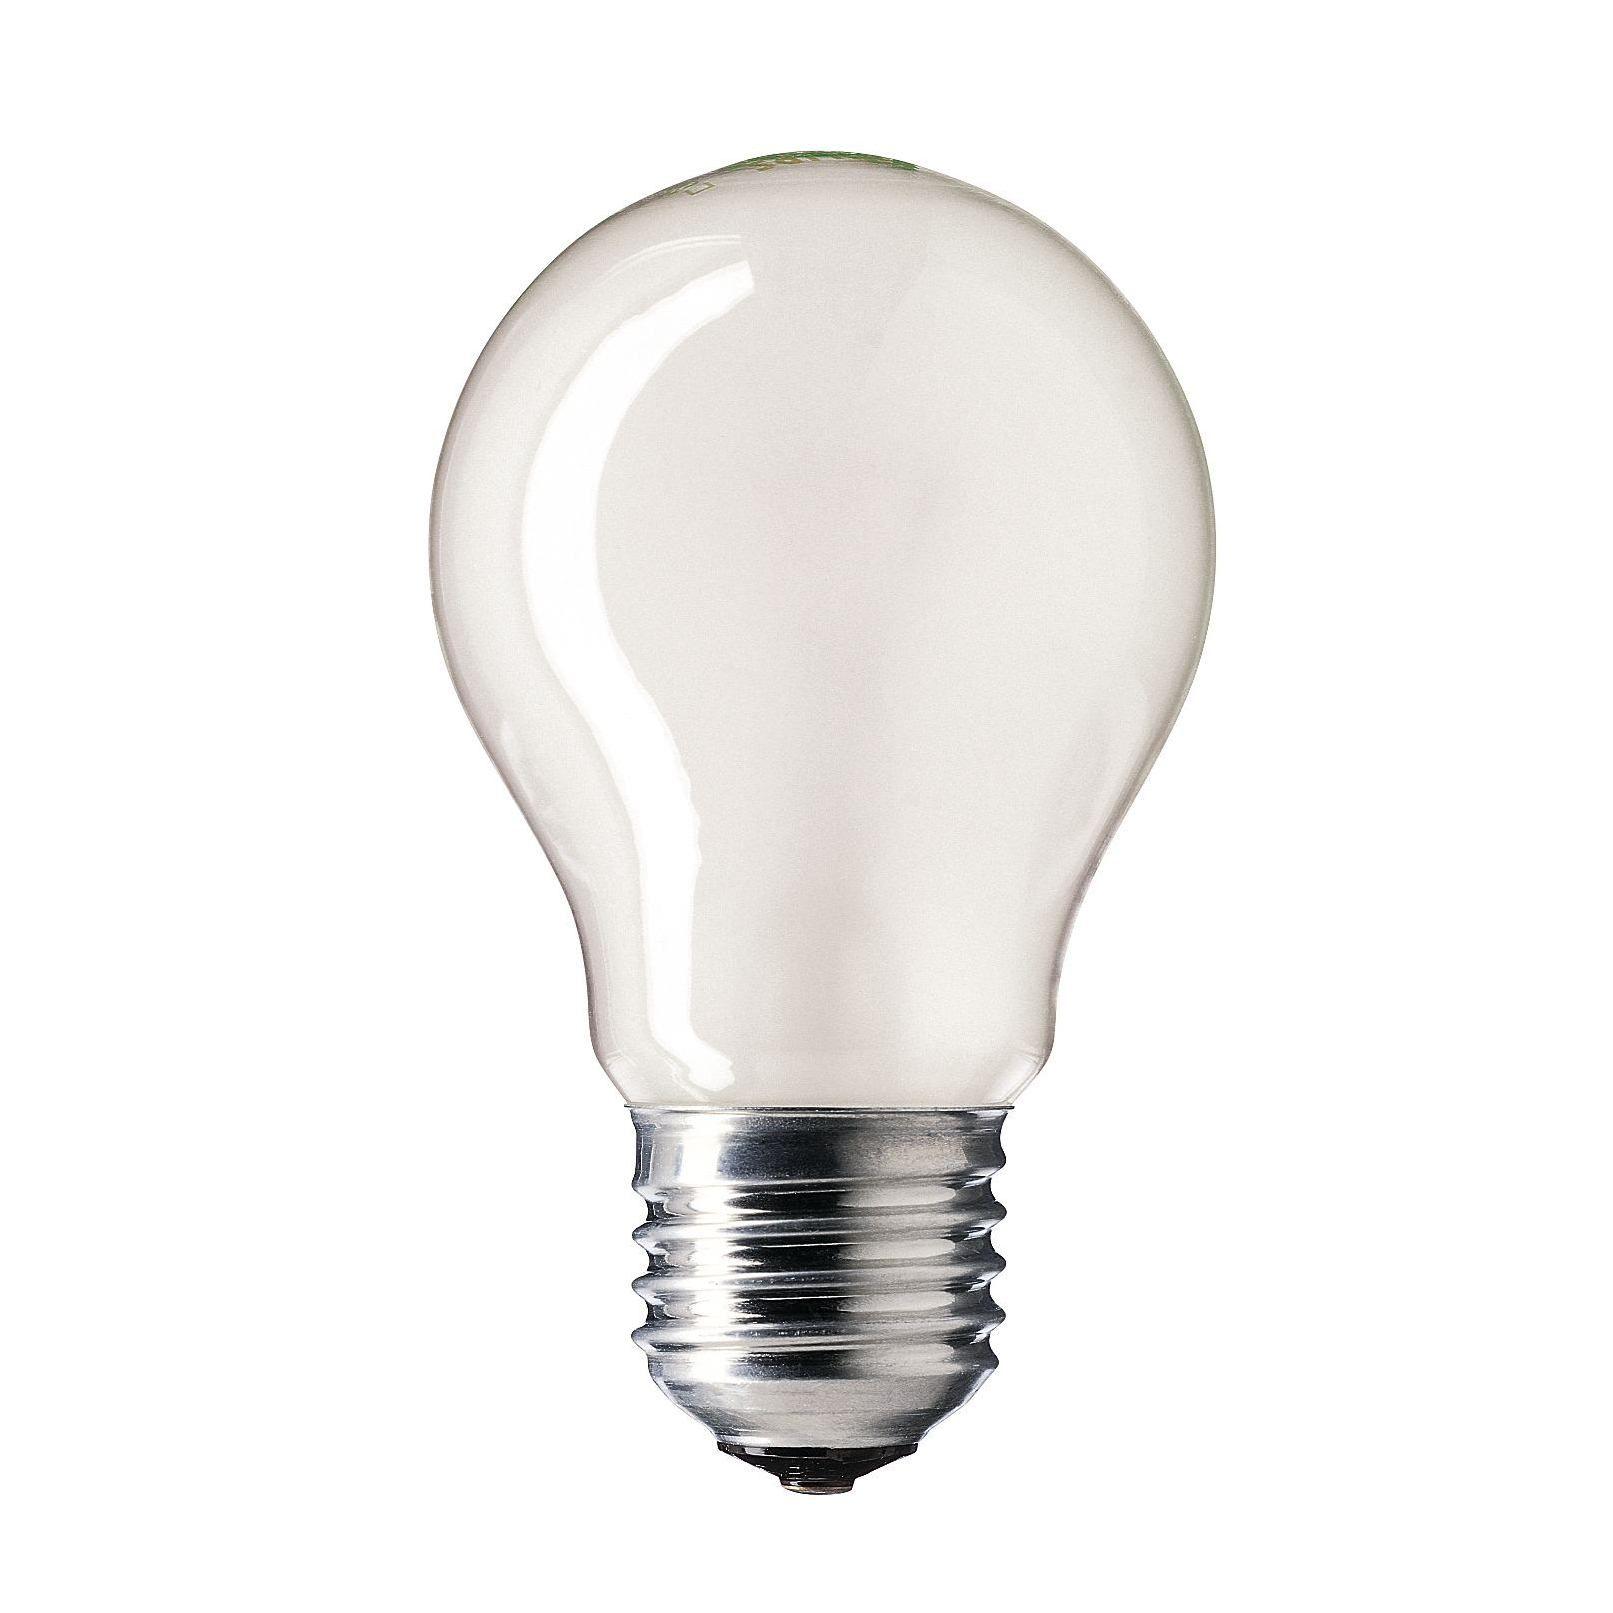 Купить Лампа накаливания Philips Stan 40W E27 230V A55 FR 1CT/12X10F матовая